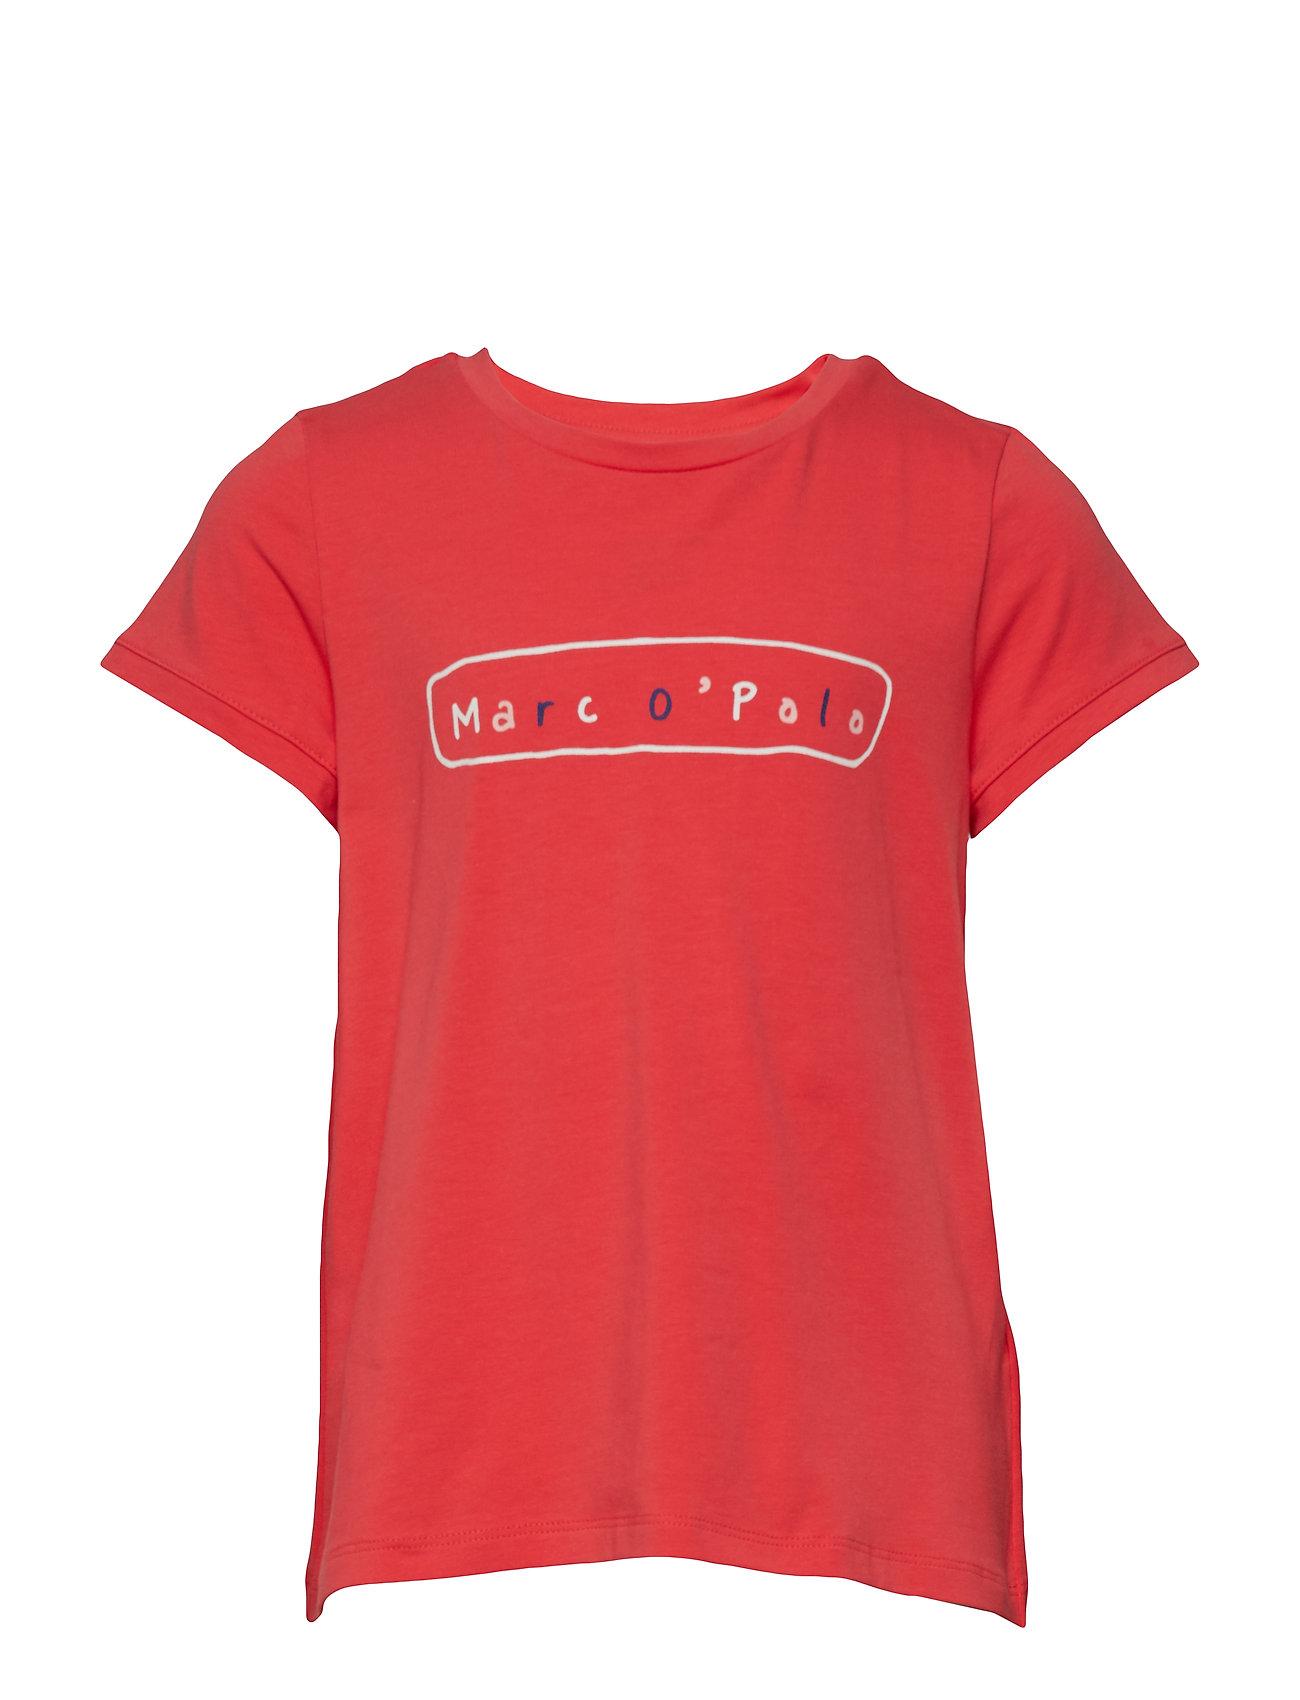 d7abd5ffe T-shirt 1 4 Arm (Cayenne-red) (£20.30) - Marc O Polo Junior ...